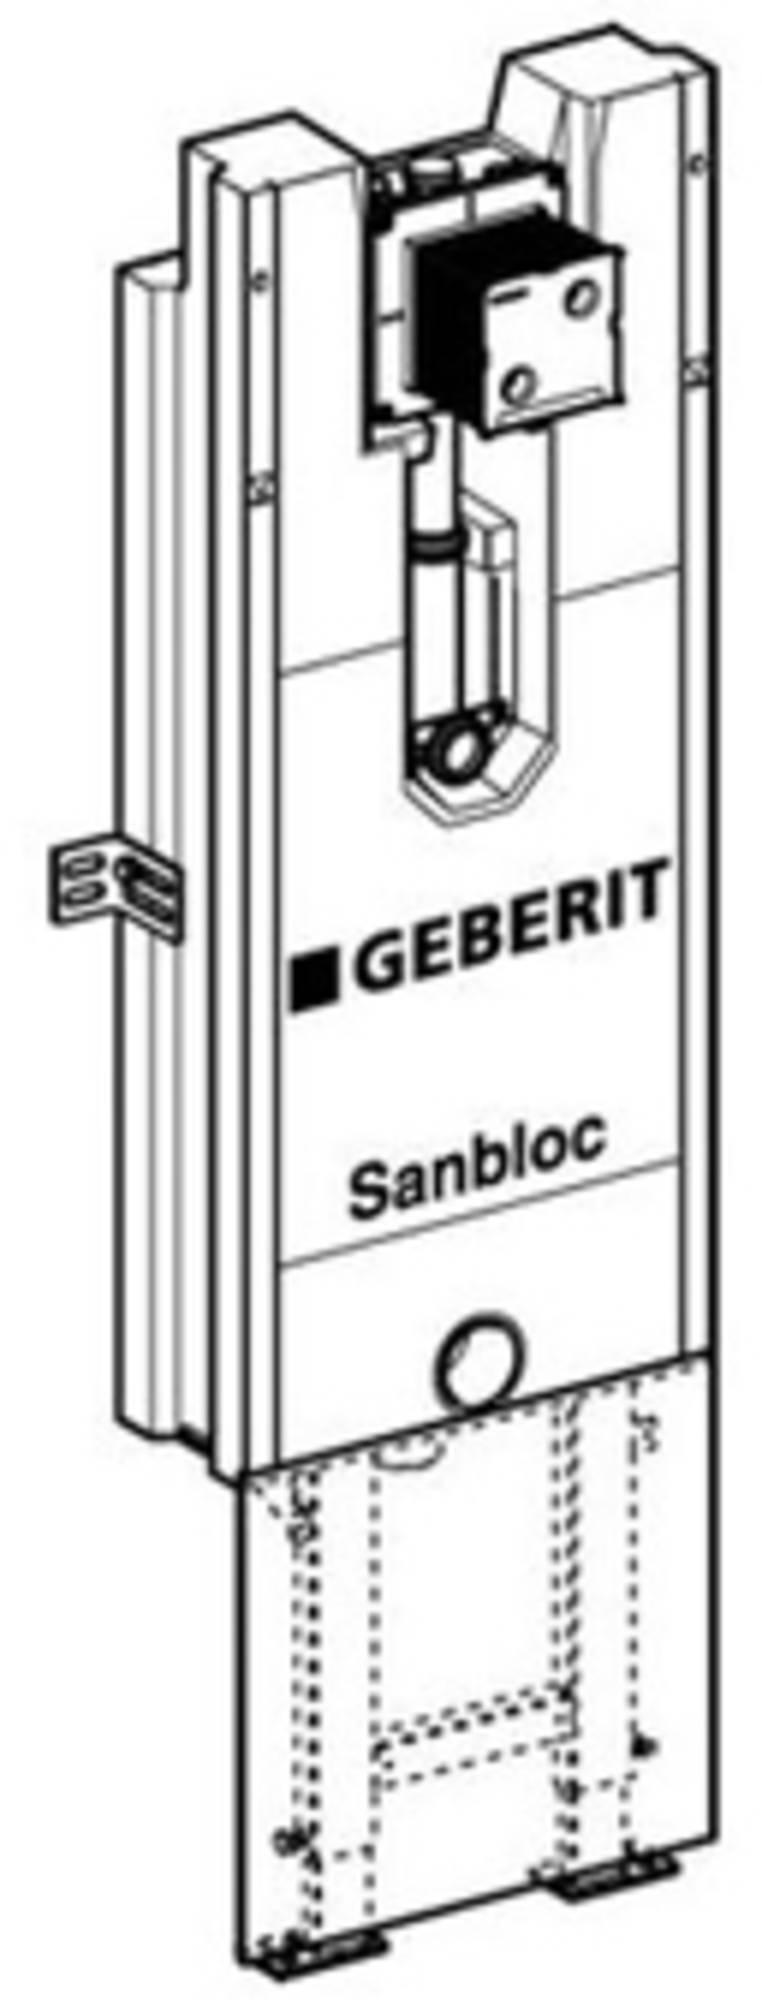 Geberit Sanbloc urinoir element h122 hoh aan-afvoer 425-520